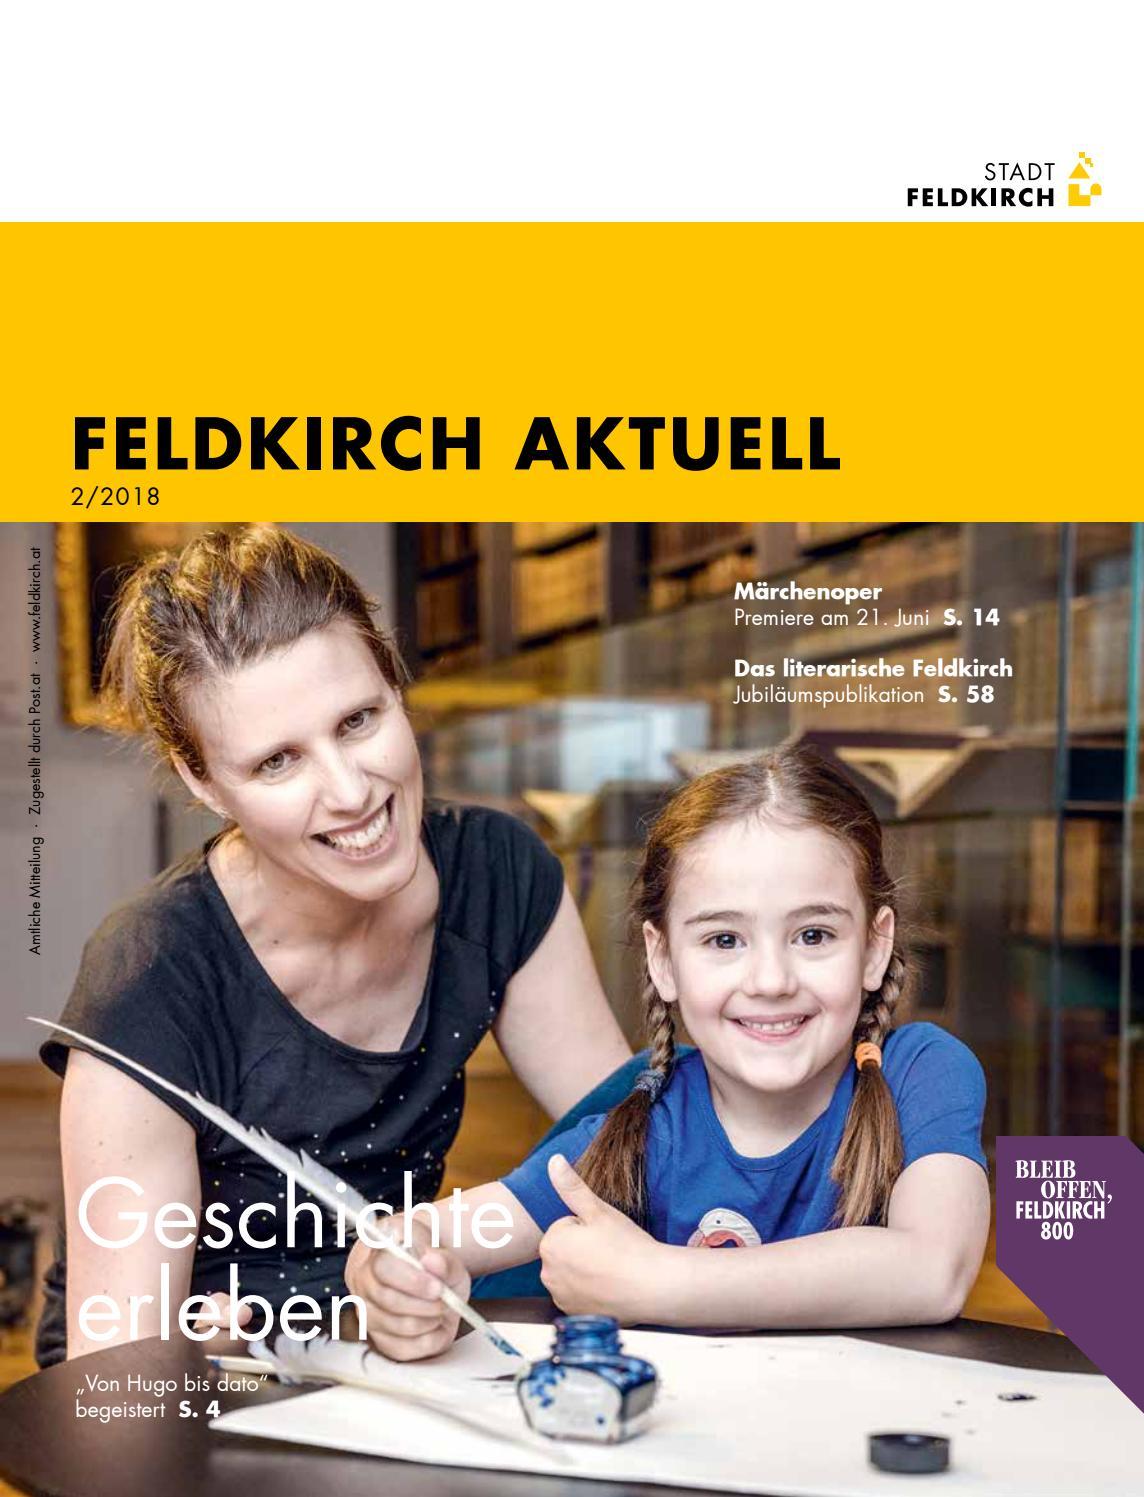 singles in Feldkirch - Bekanntschaften - Partnersuche